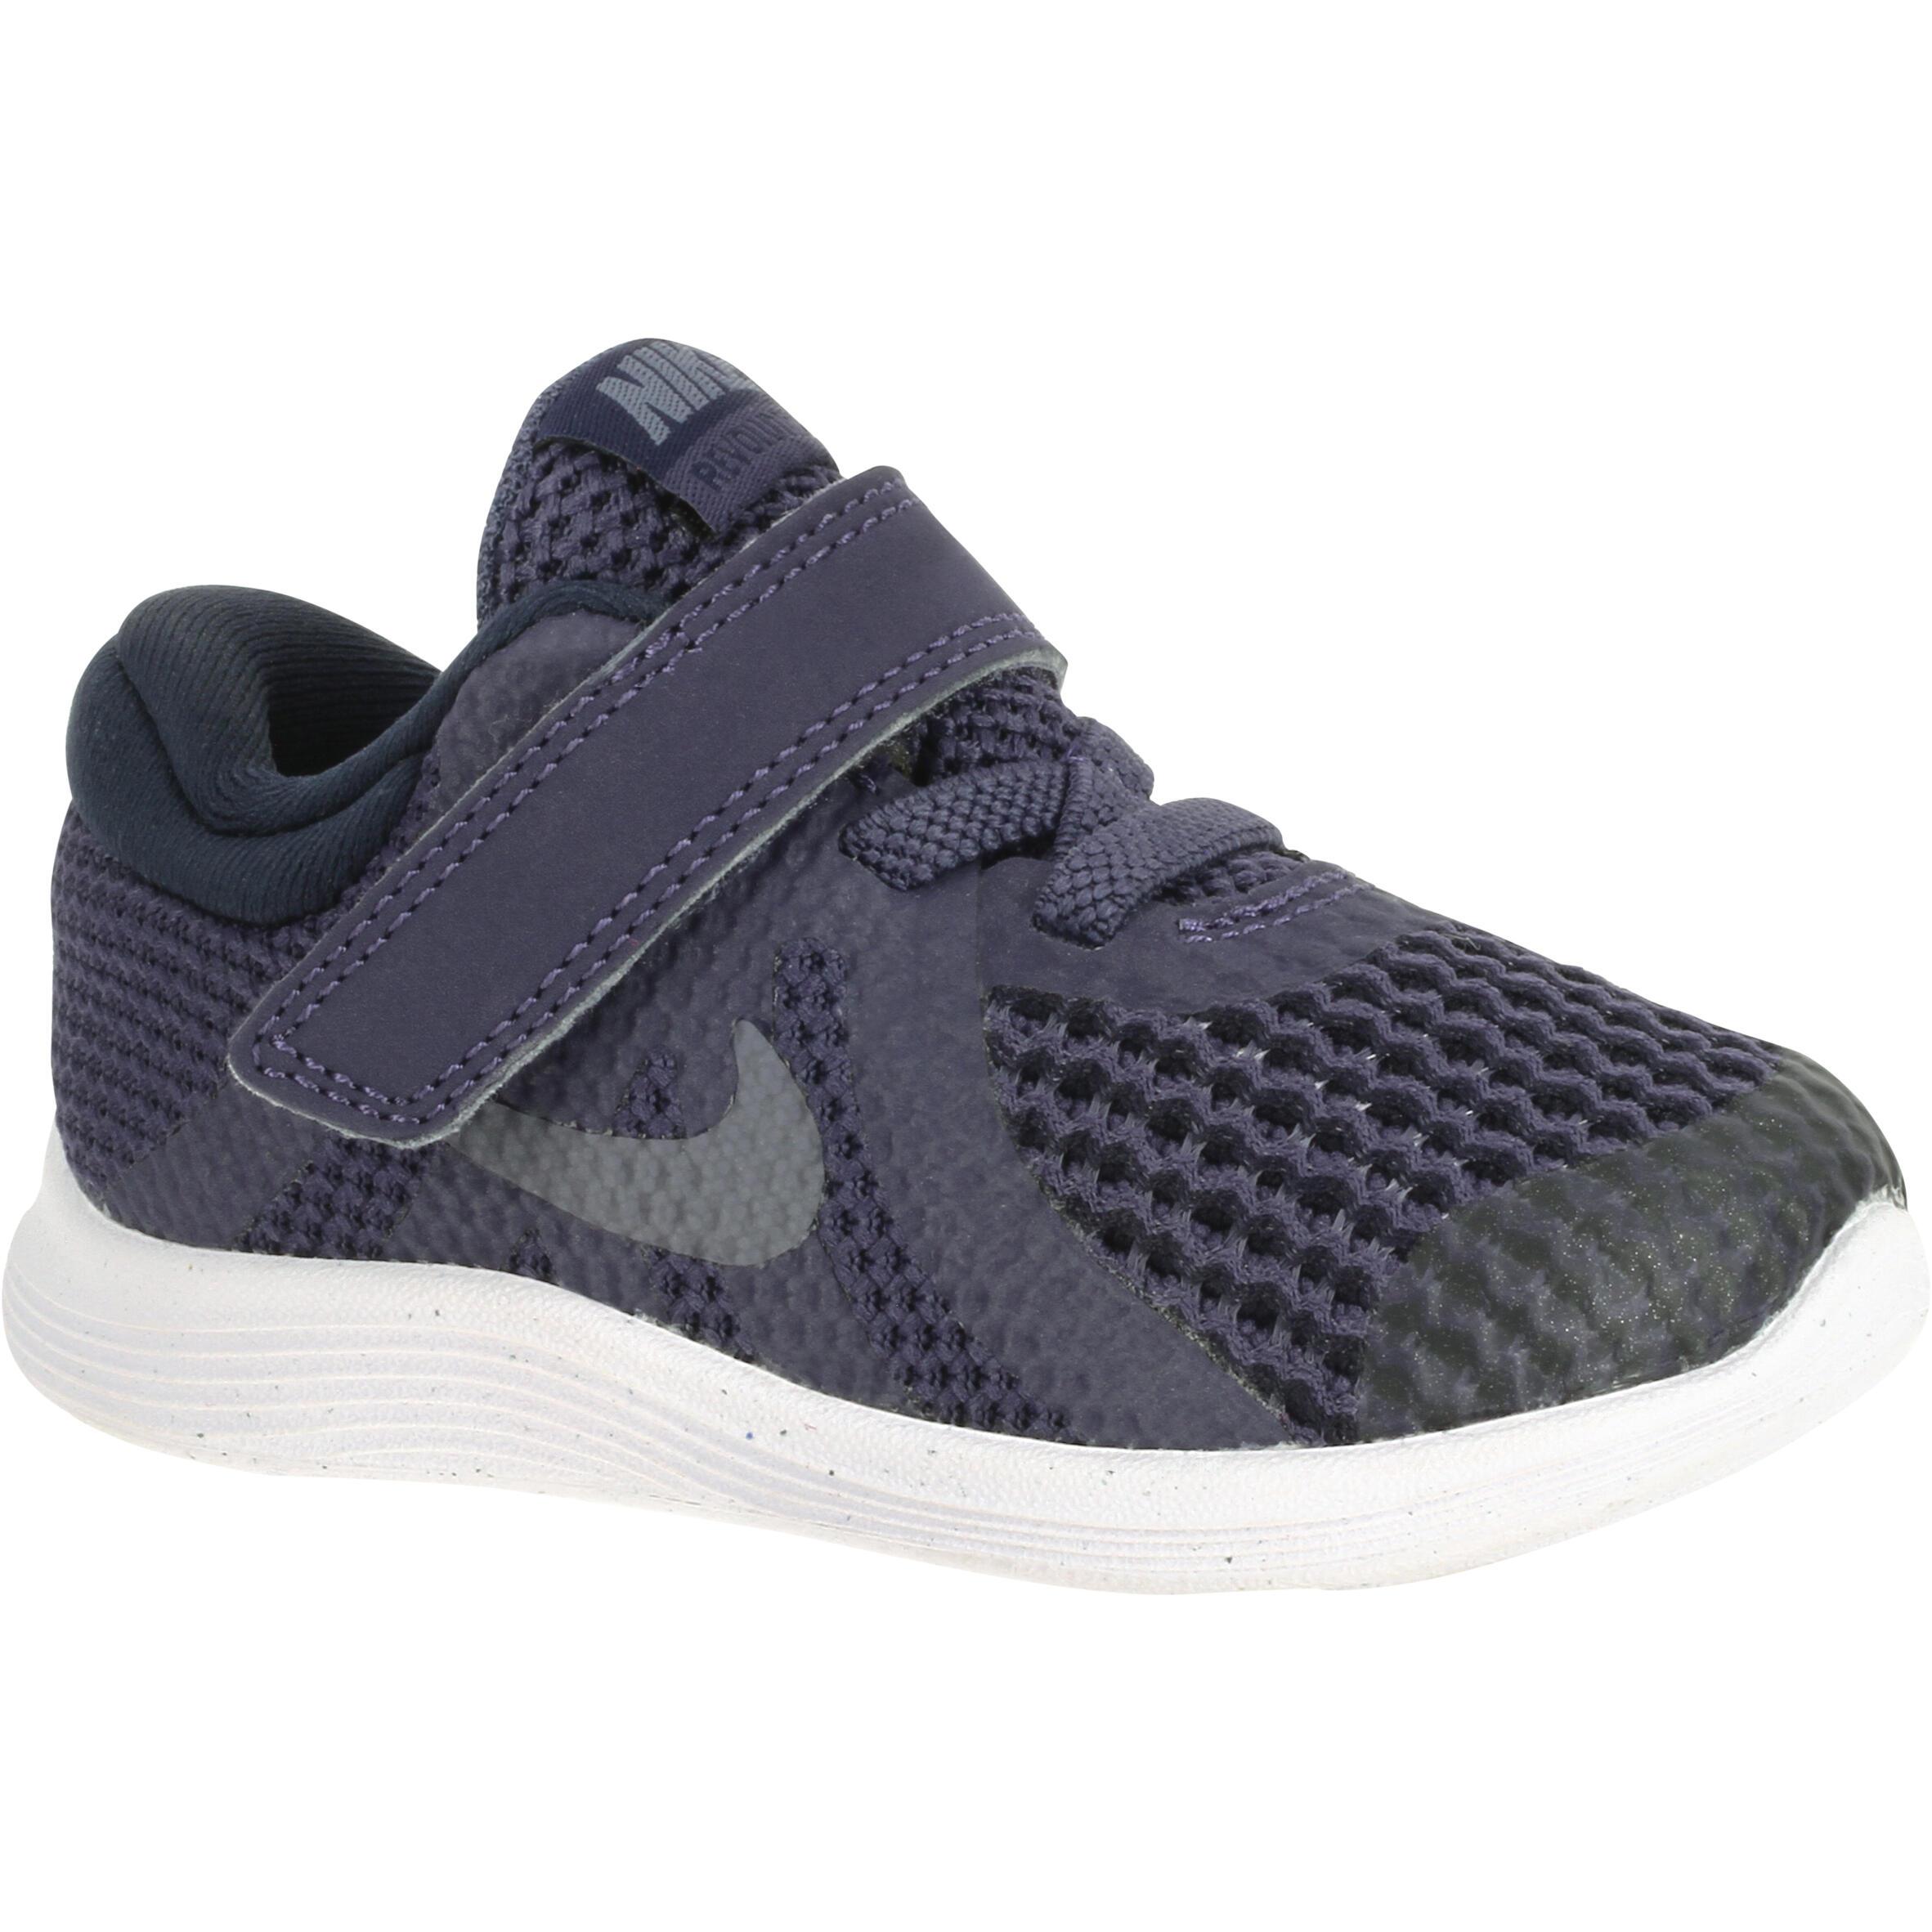 new style fb18c 51aed Nike - Decathlon